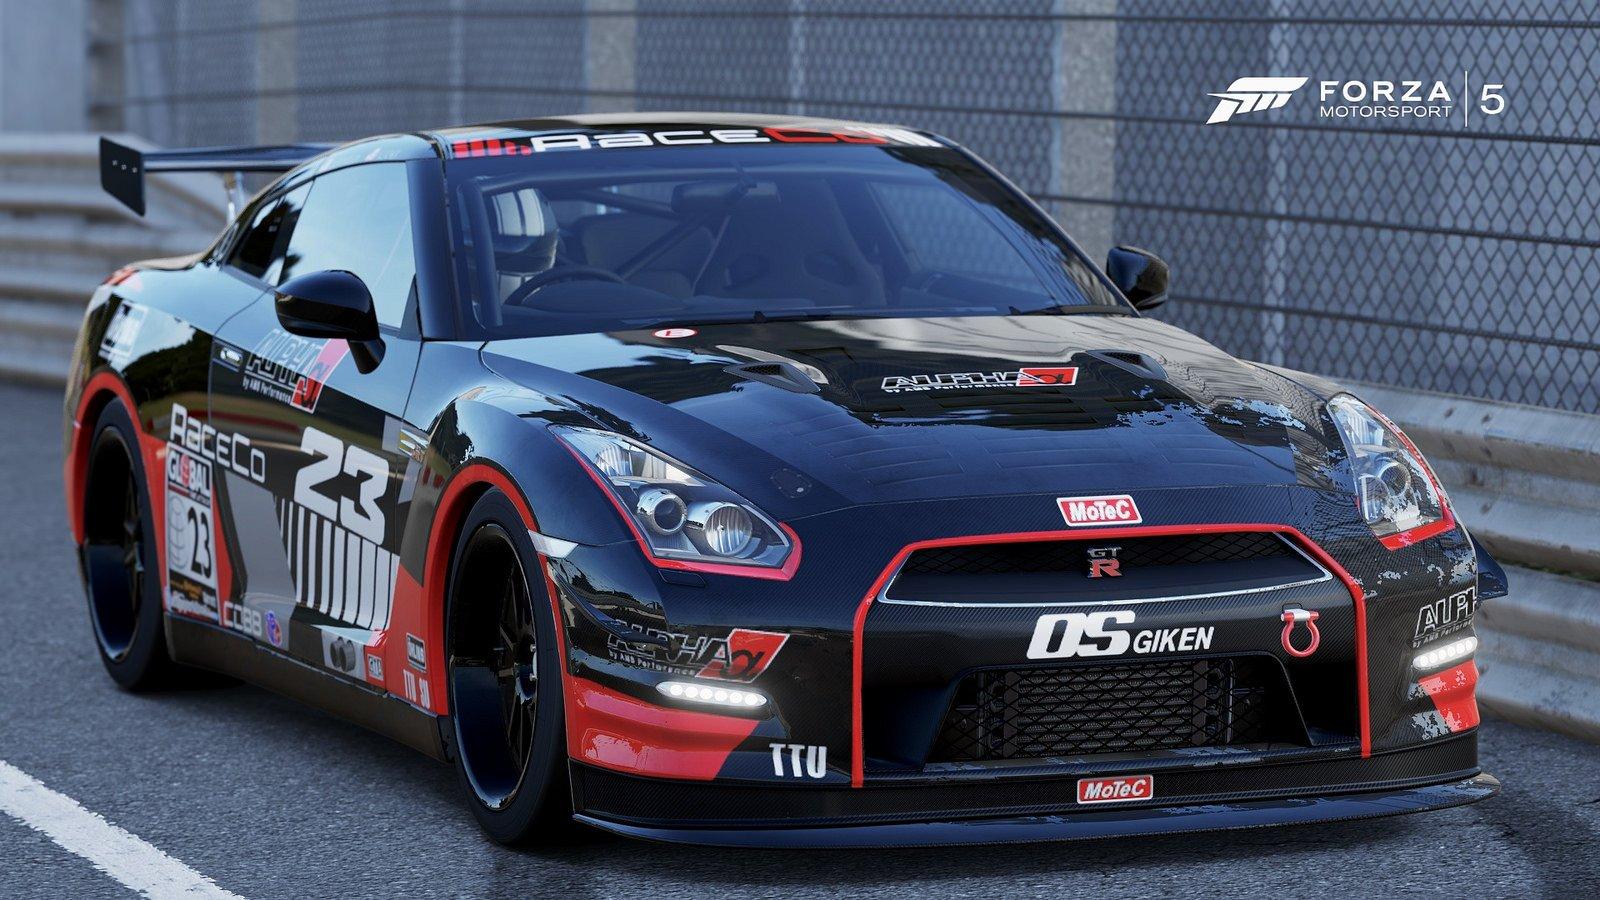 Nissan Gt R R35 Black Edition Forza Motorsport 3 Cars Videogames Wallpaper 1600x900 493962 Wallpaperup